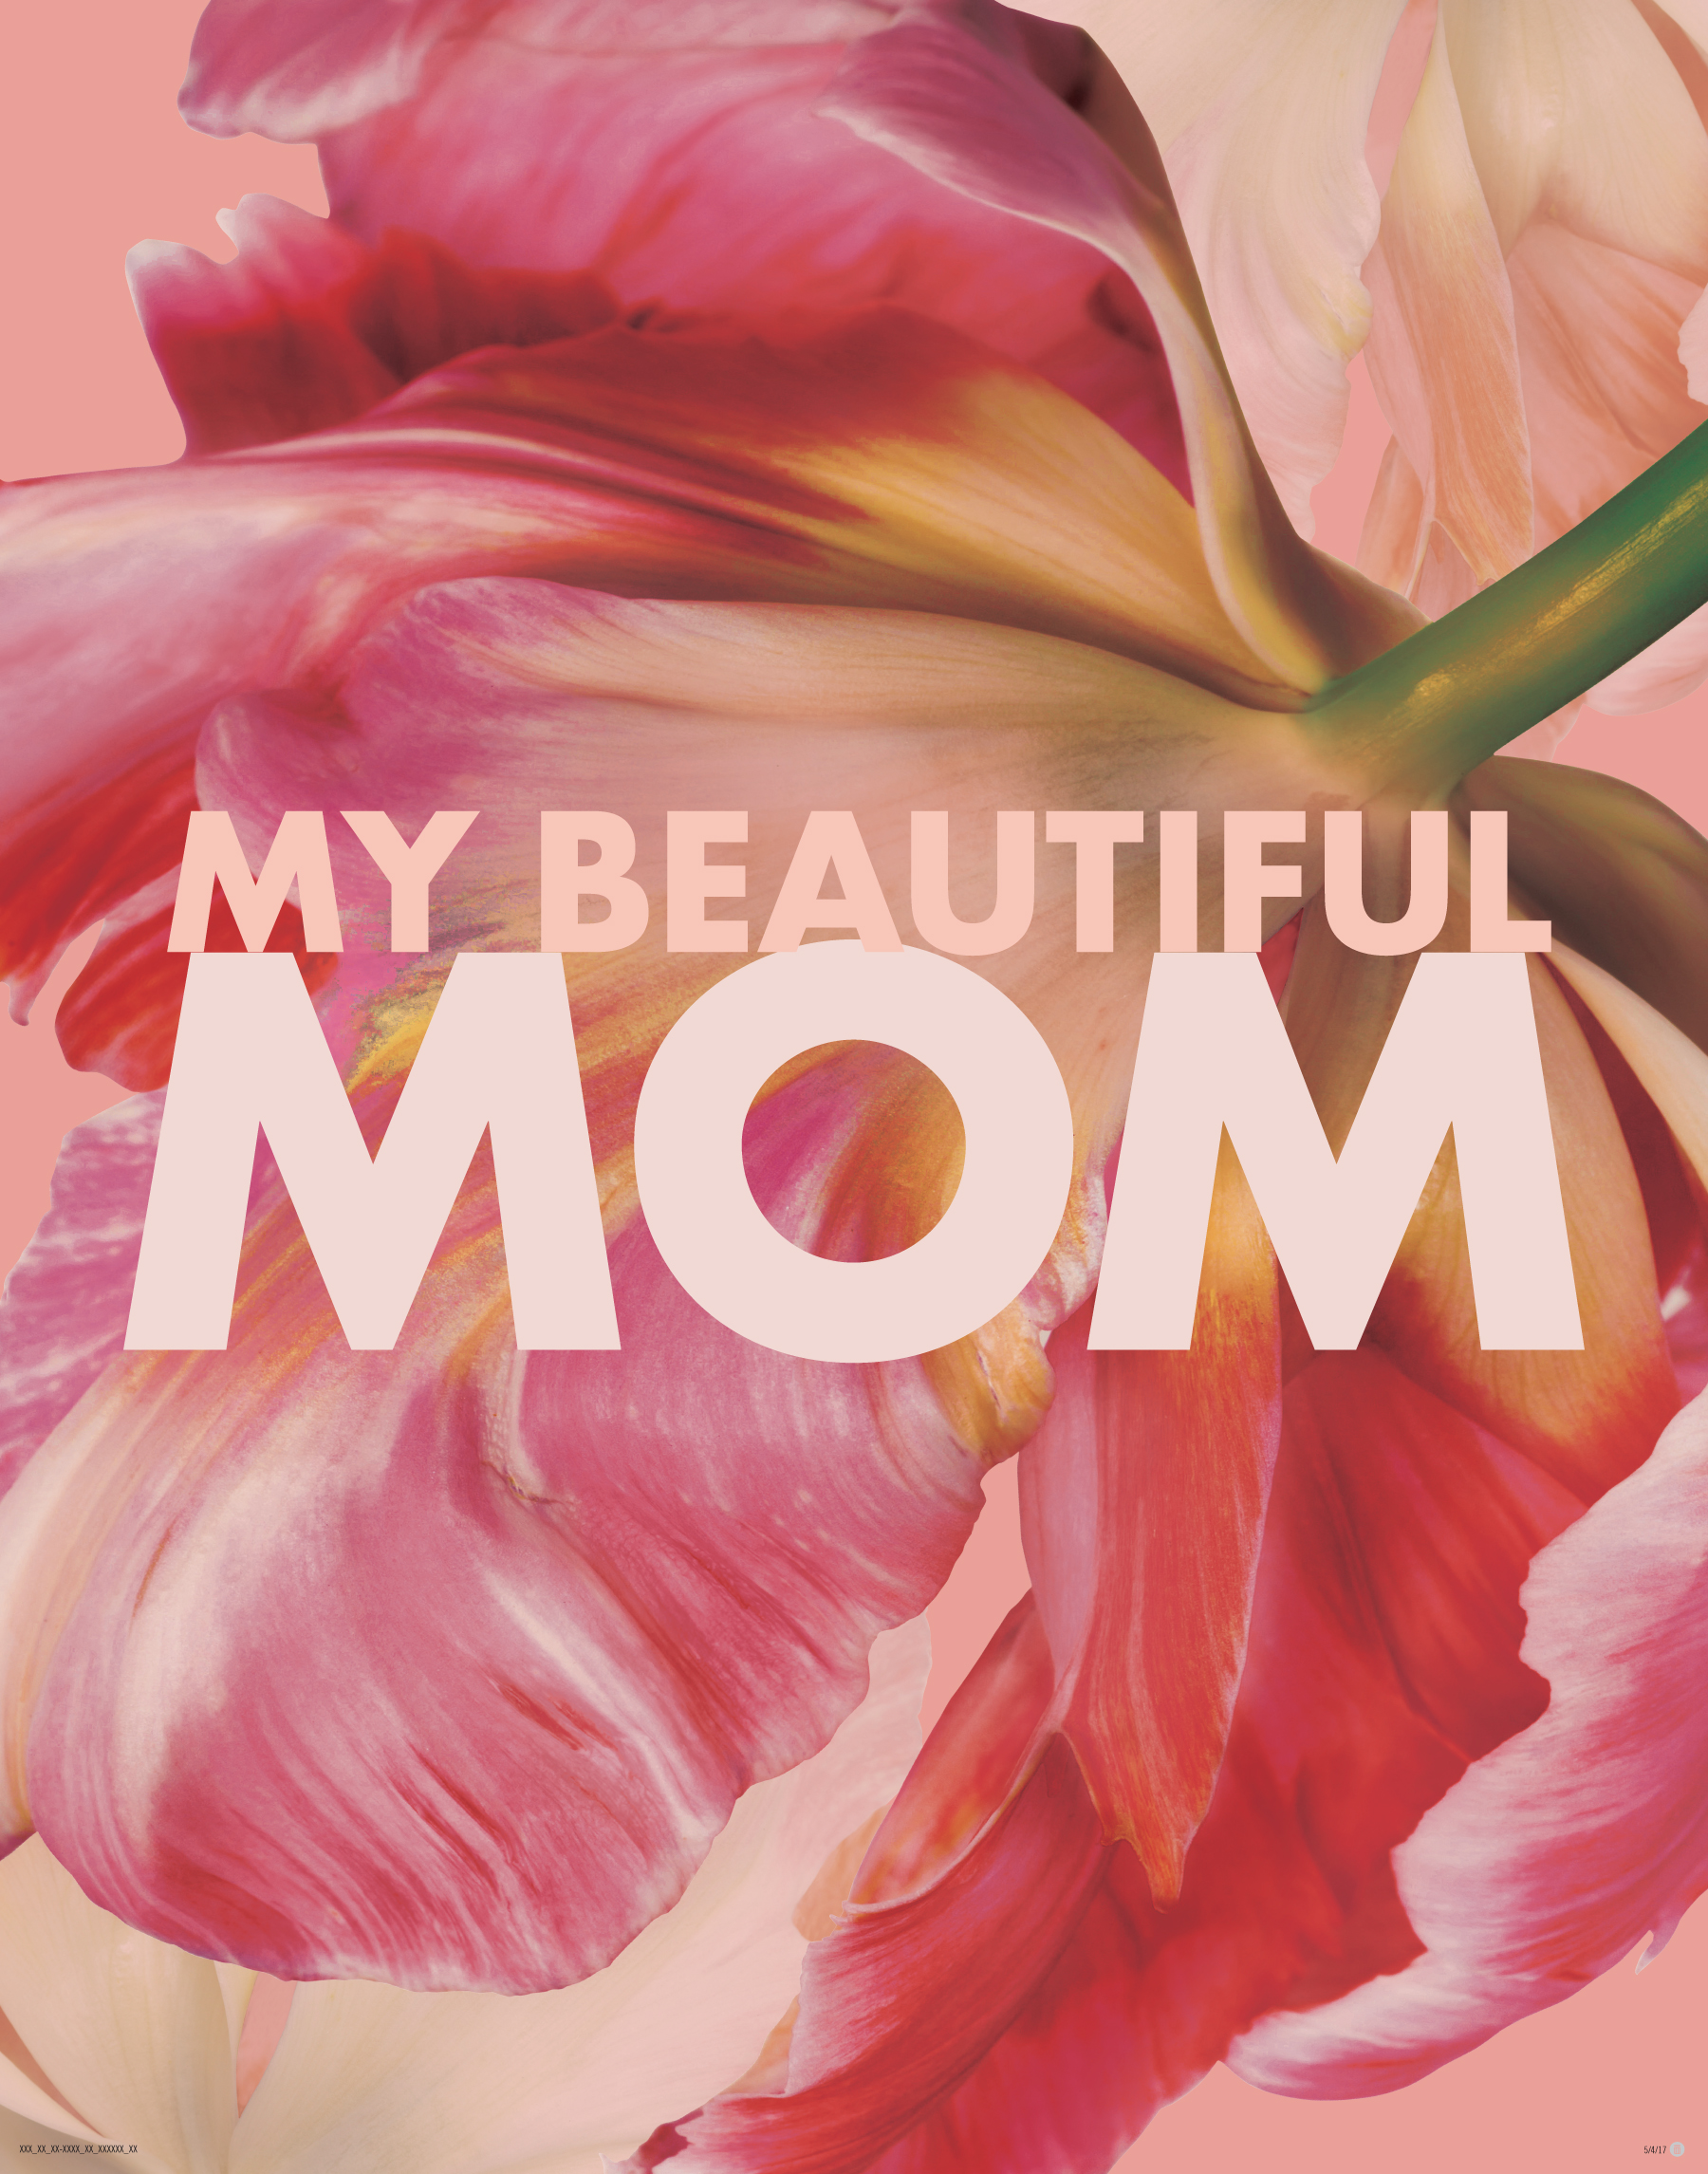 Murale Mother's Day 2017 Tstand 22 x 28